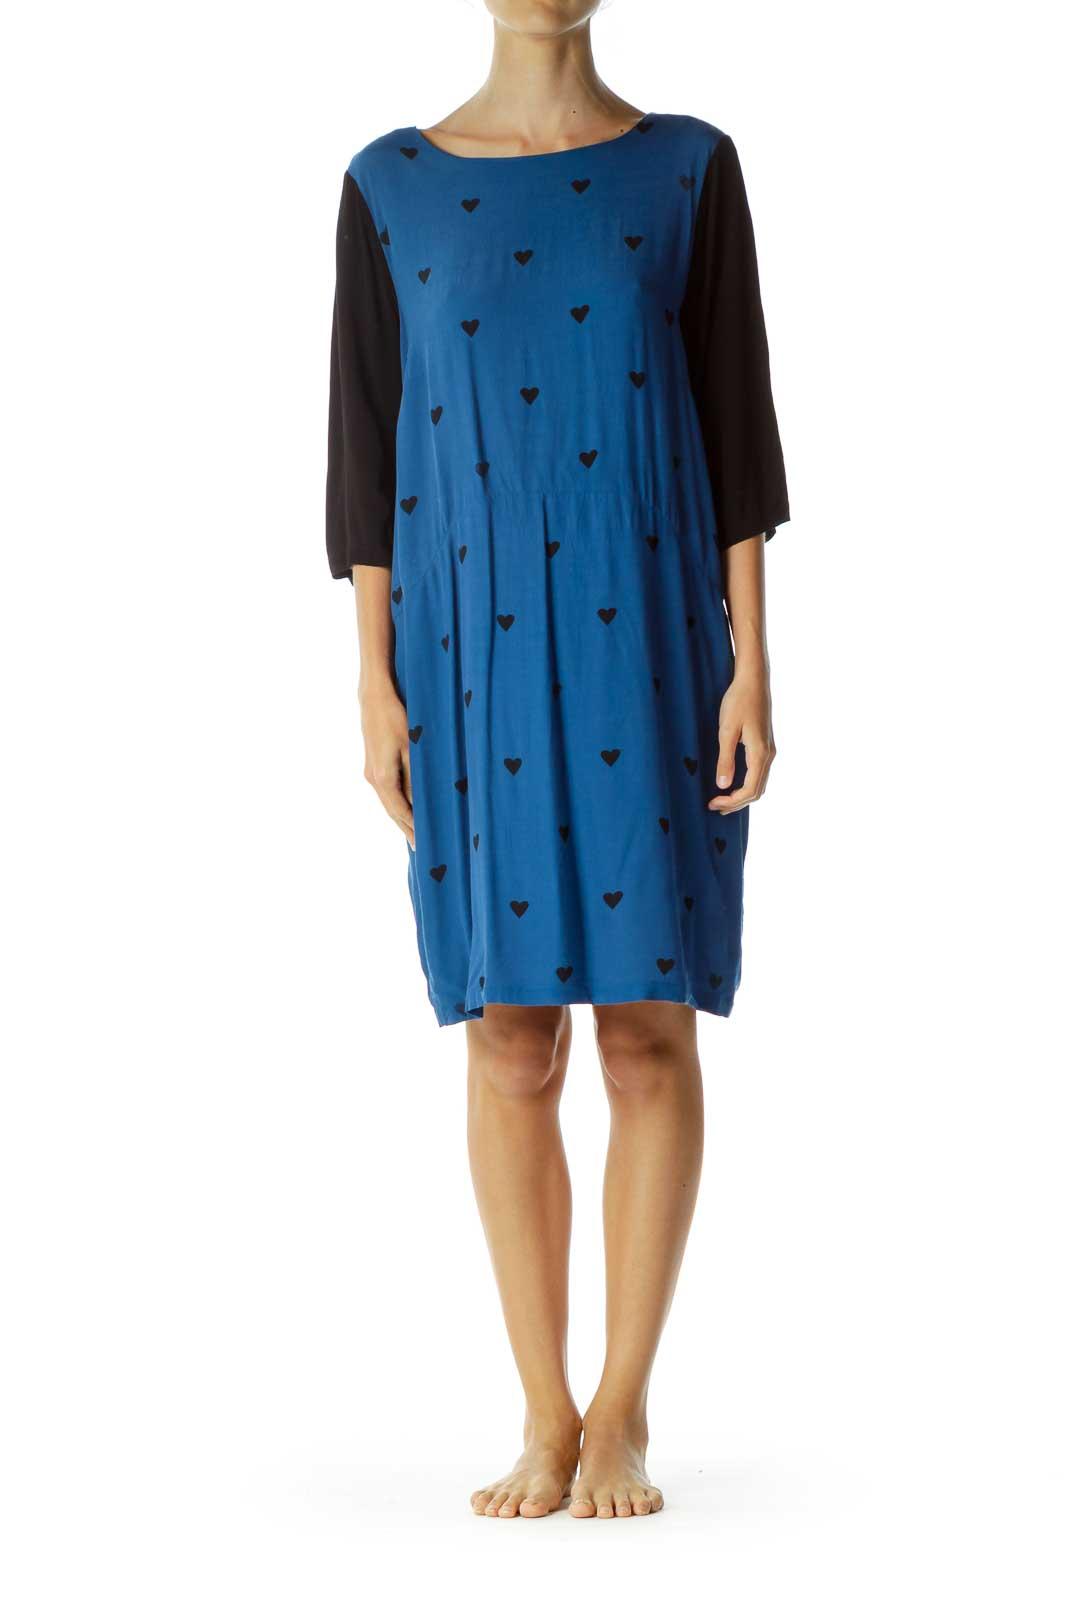 Blue Black Heart Print Day Dress